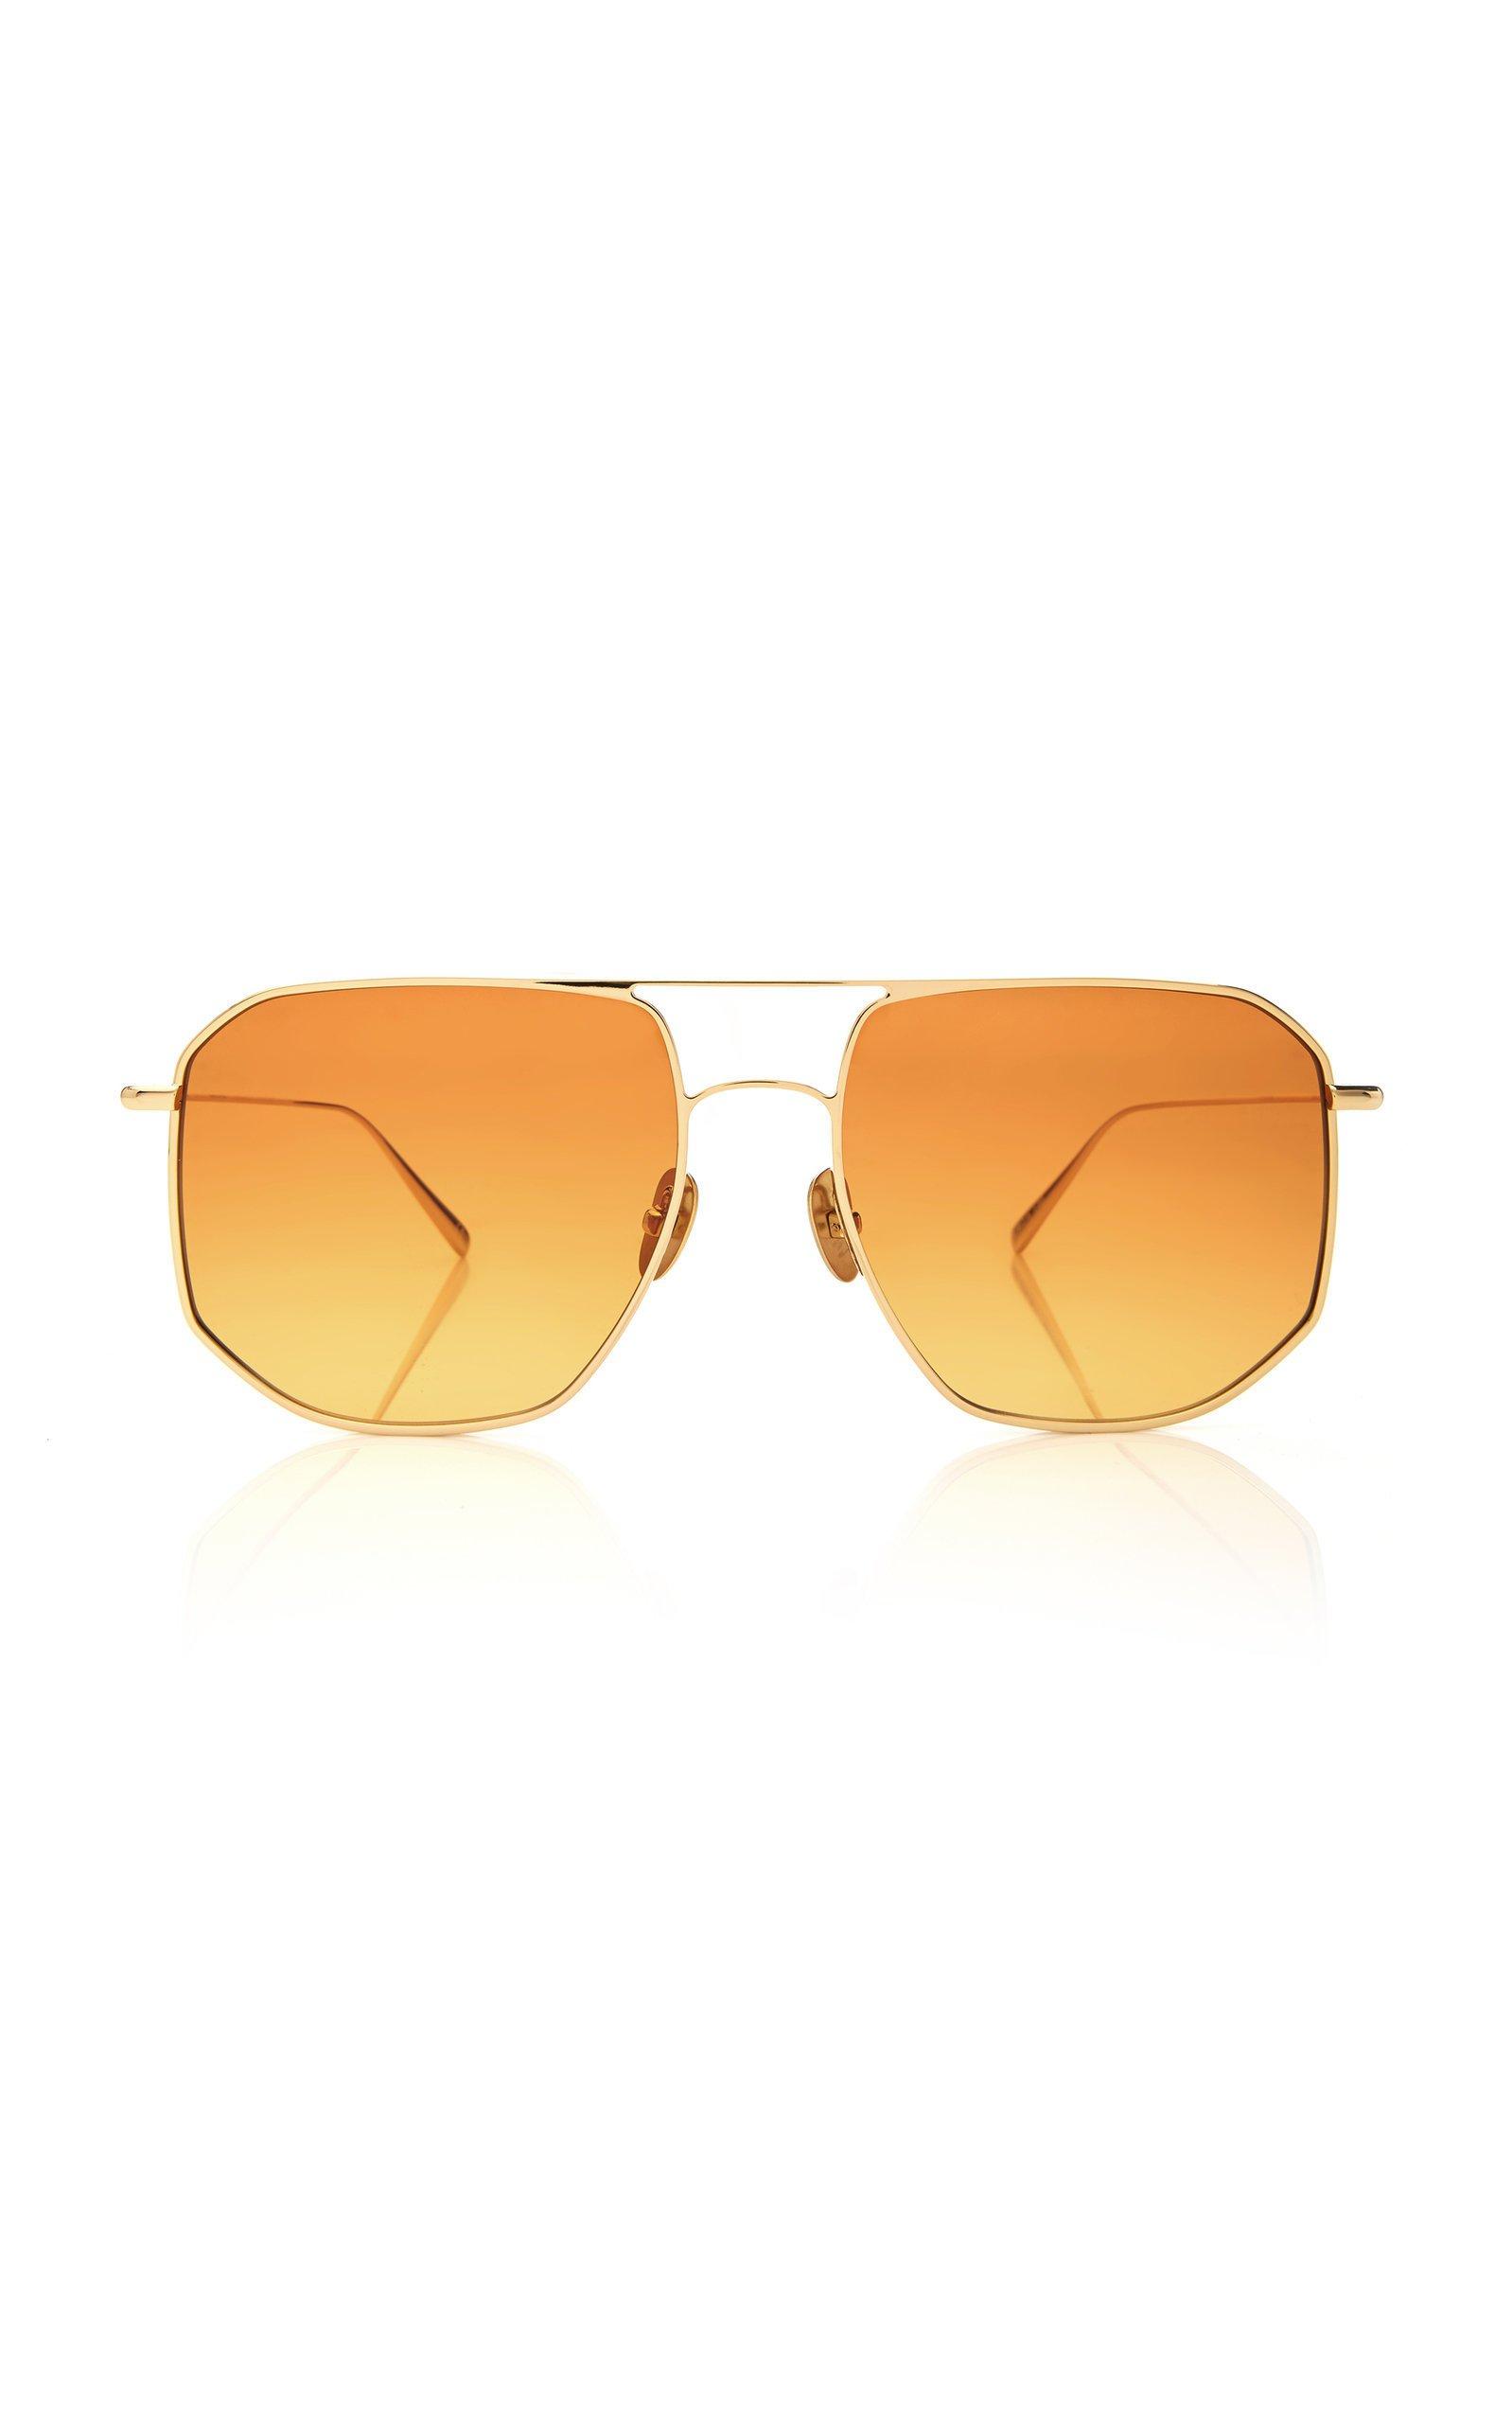 Kaleos Eyehunters LaMotta Hexagon-Frame Metal Sunglasses